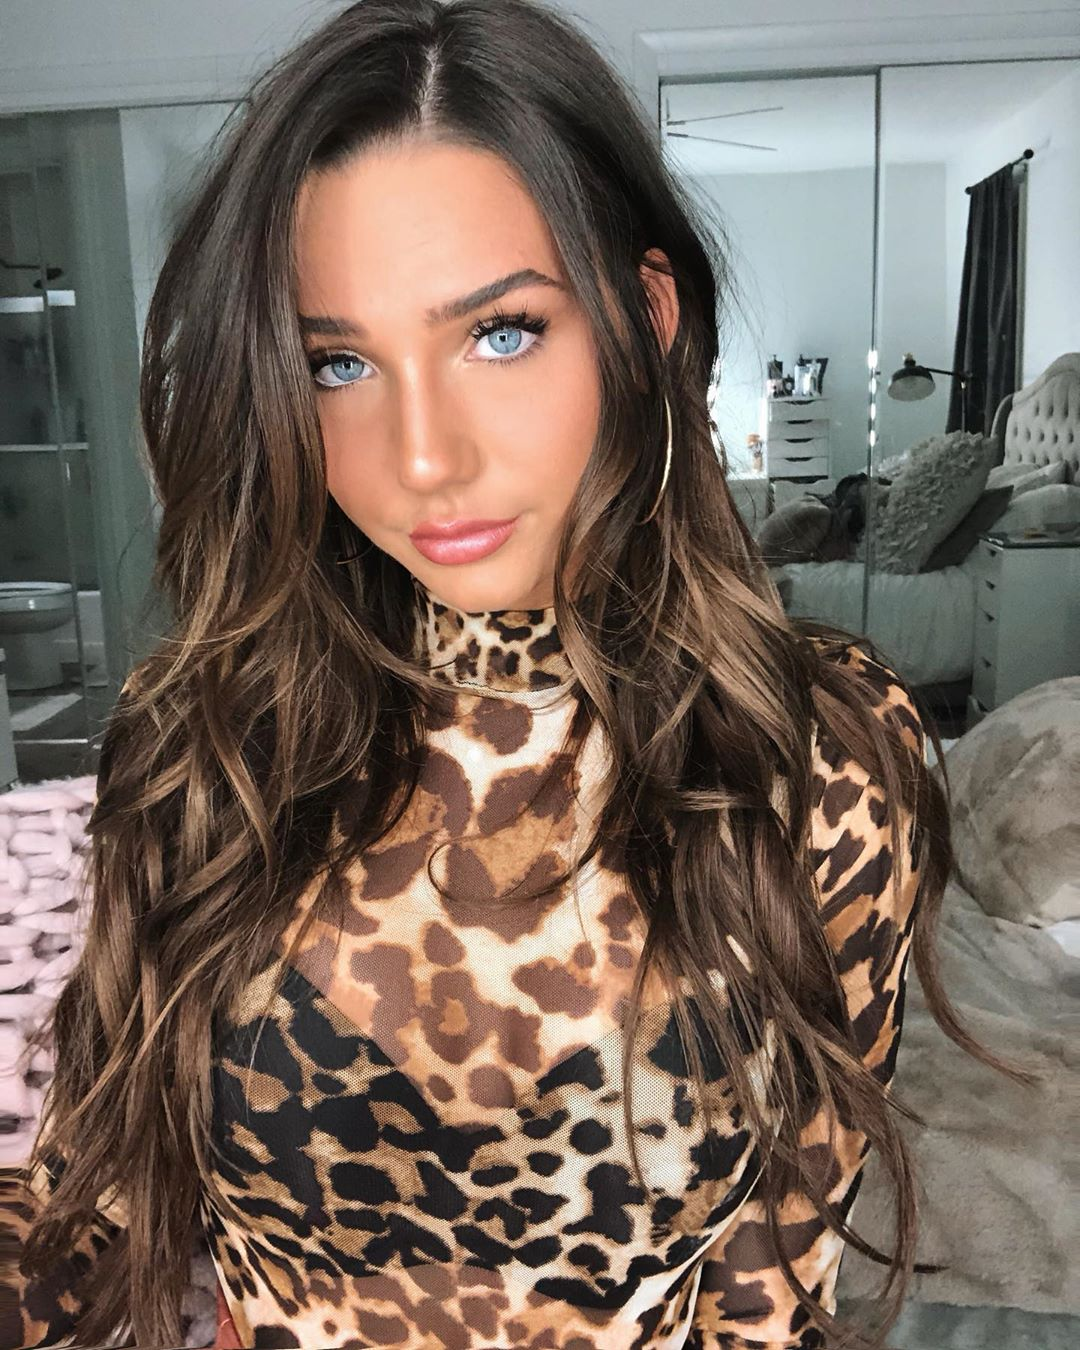 JobbieCrews Hot Honey of the Week: West Virginia model